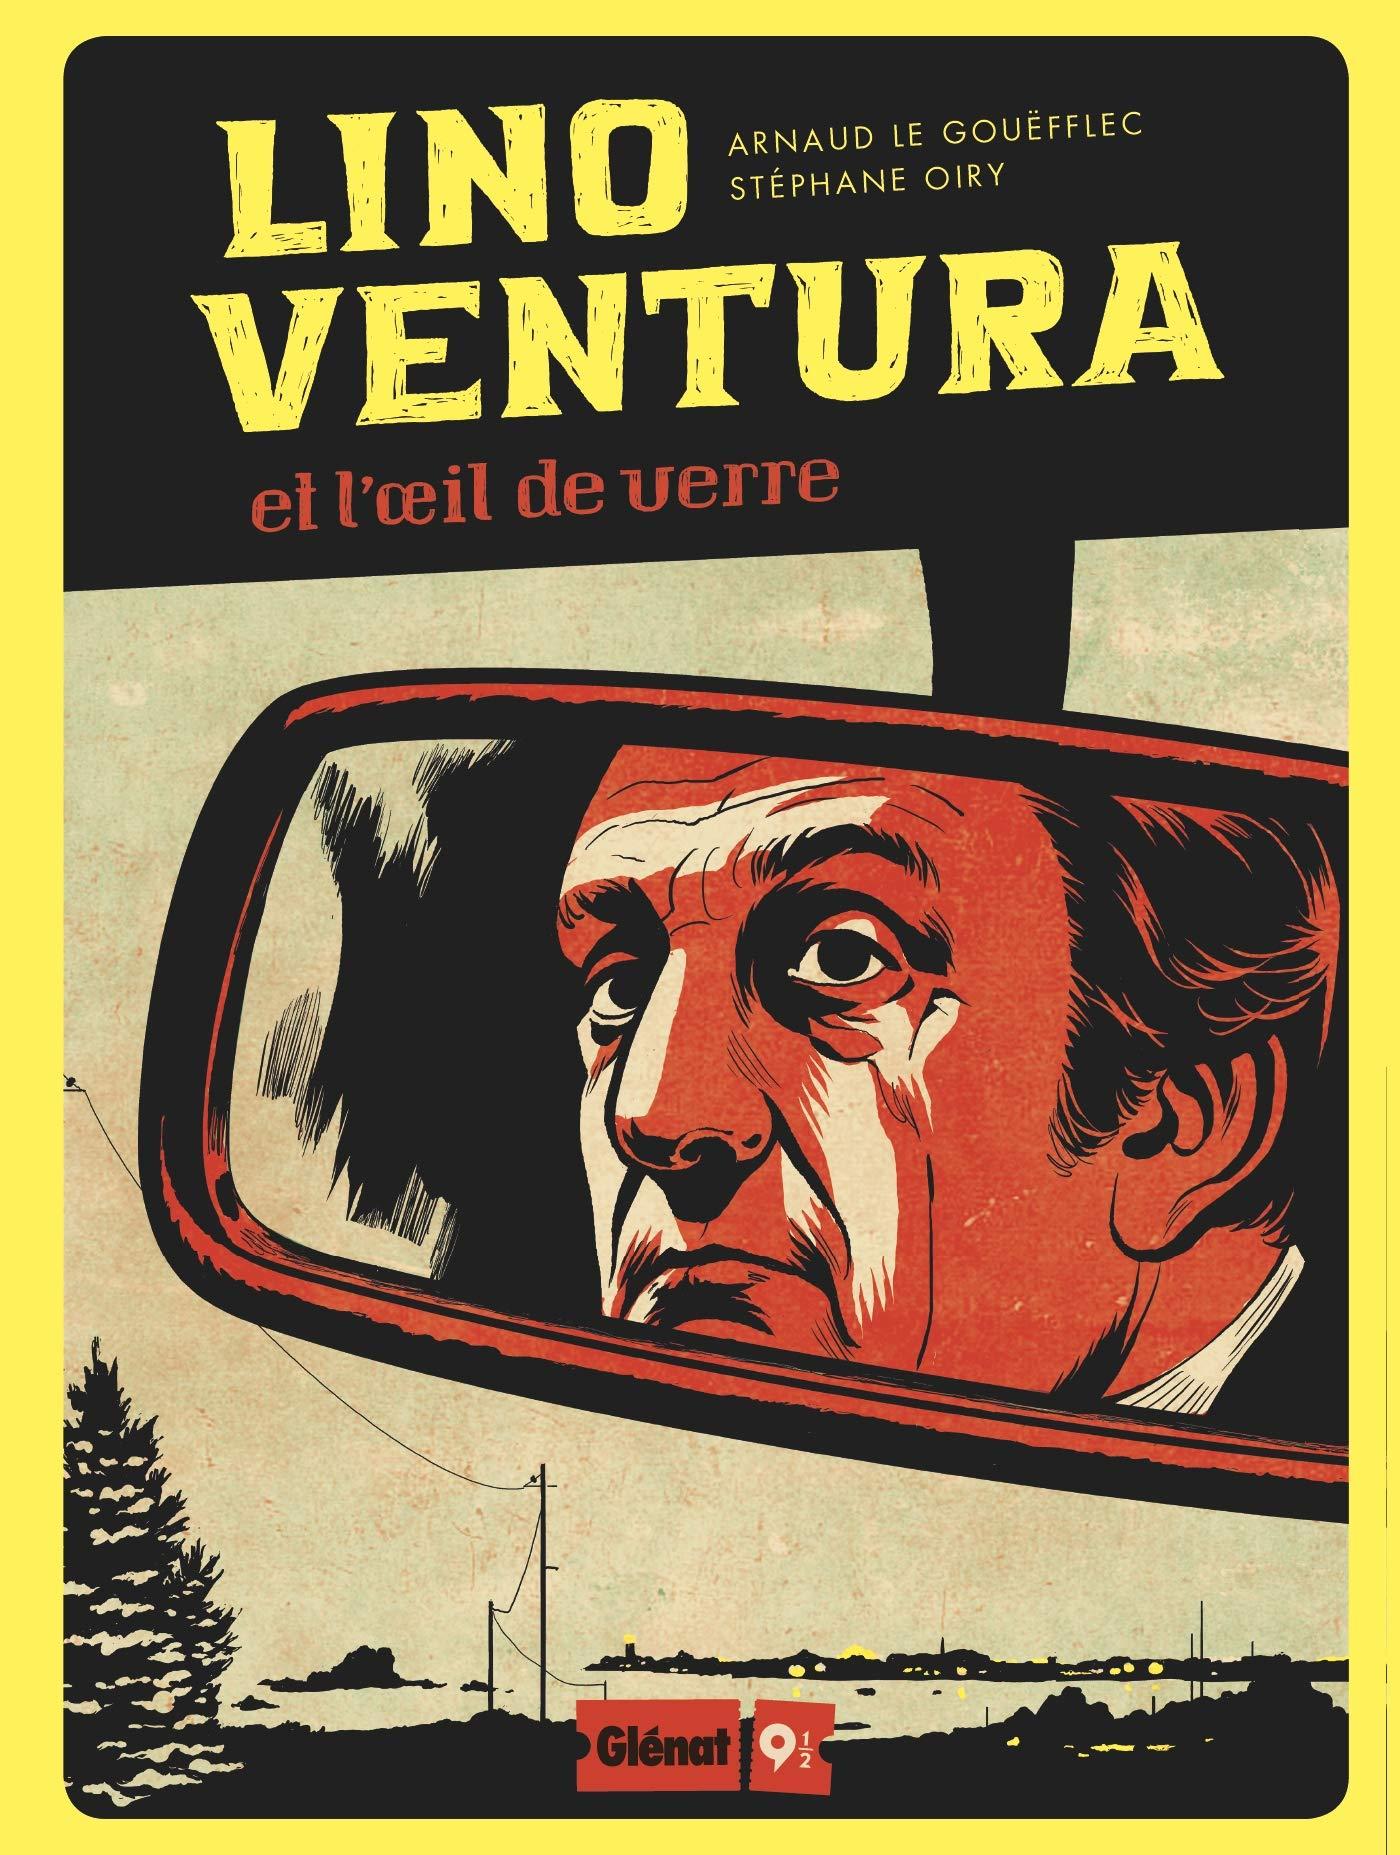 Lino ventura 0 - Lino Ventura et l'oeil de verre